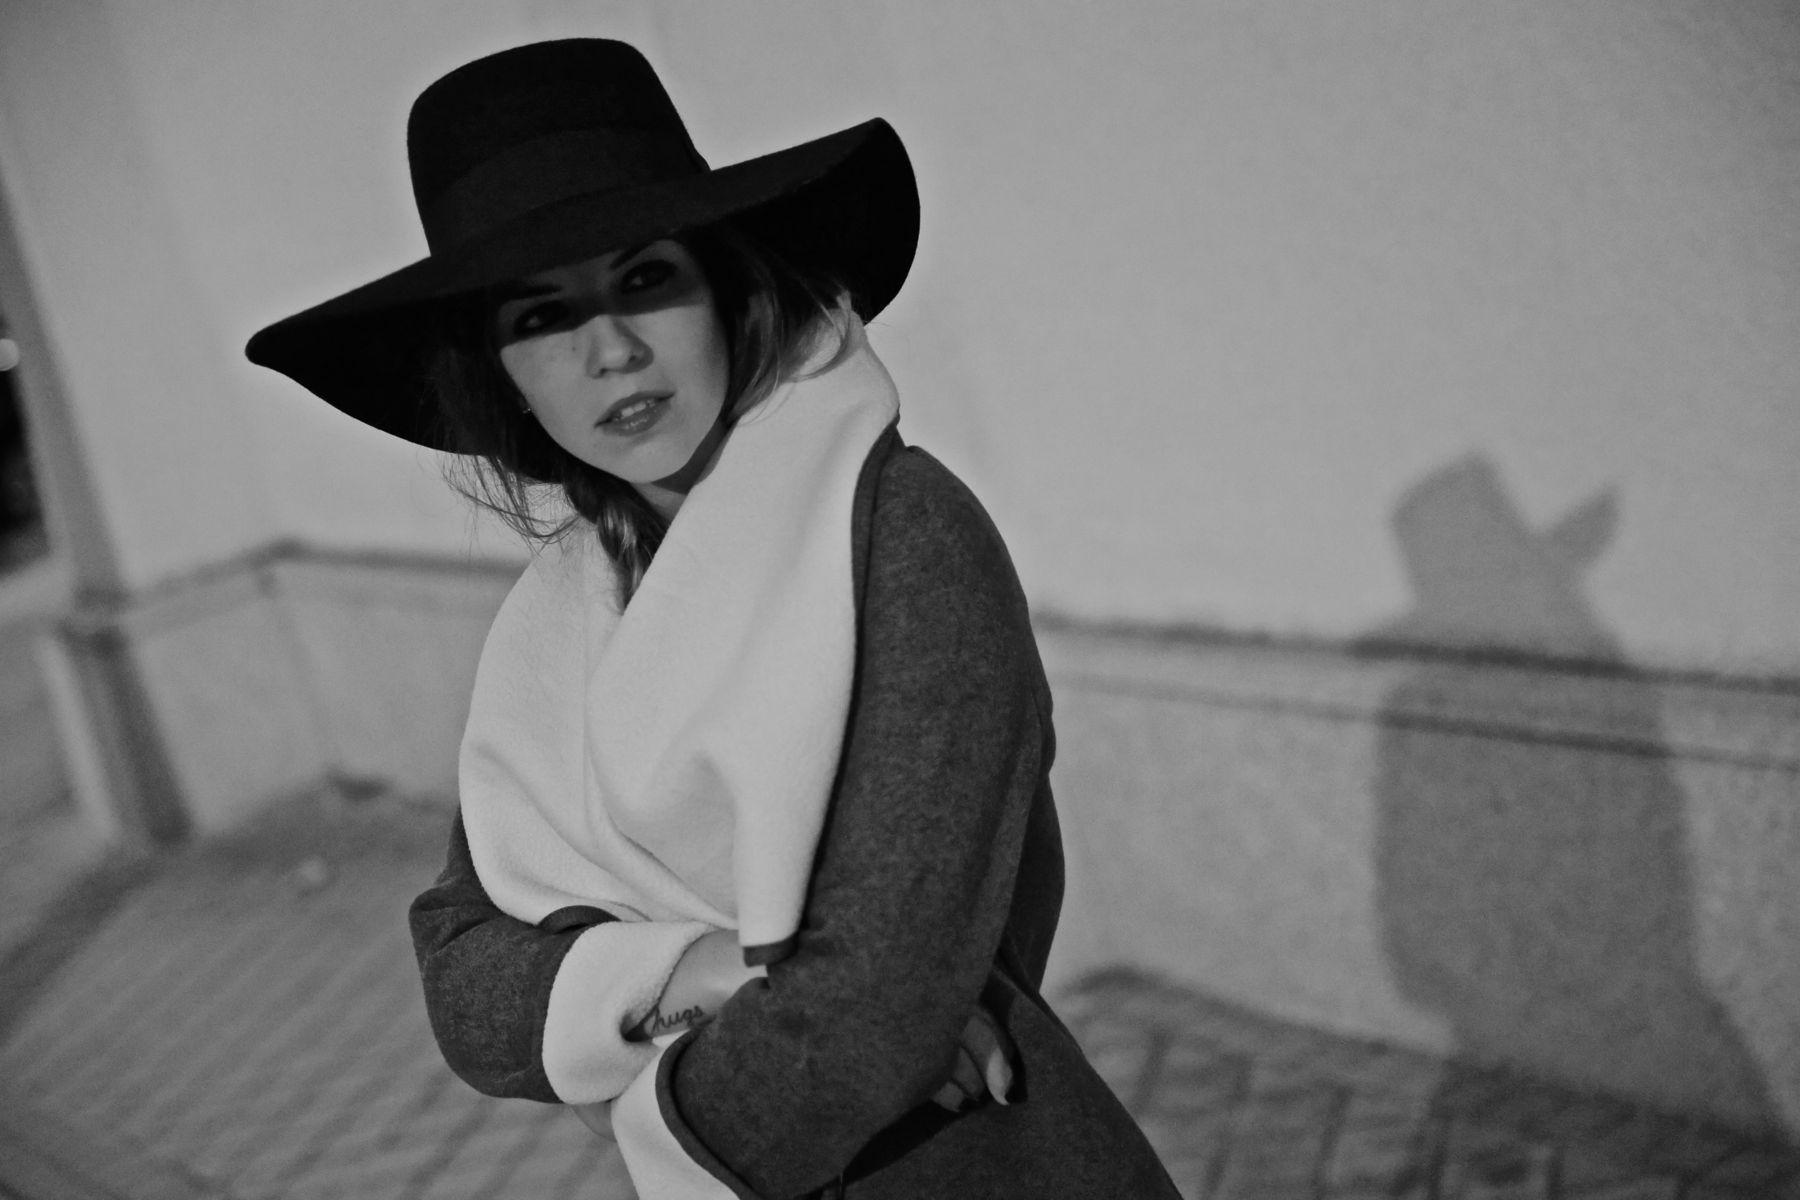 trendy_taste-look-outfit-street_style-ootd-blog-blogger-fashion_spain-moda_españa-abrigo_borrego-borreguillo-otoño-frio-cold-hat-sombrero-boho-hippie-steve_madden-skinny_jeans-pitillos-fall-1